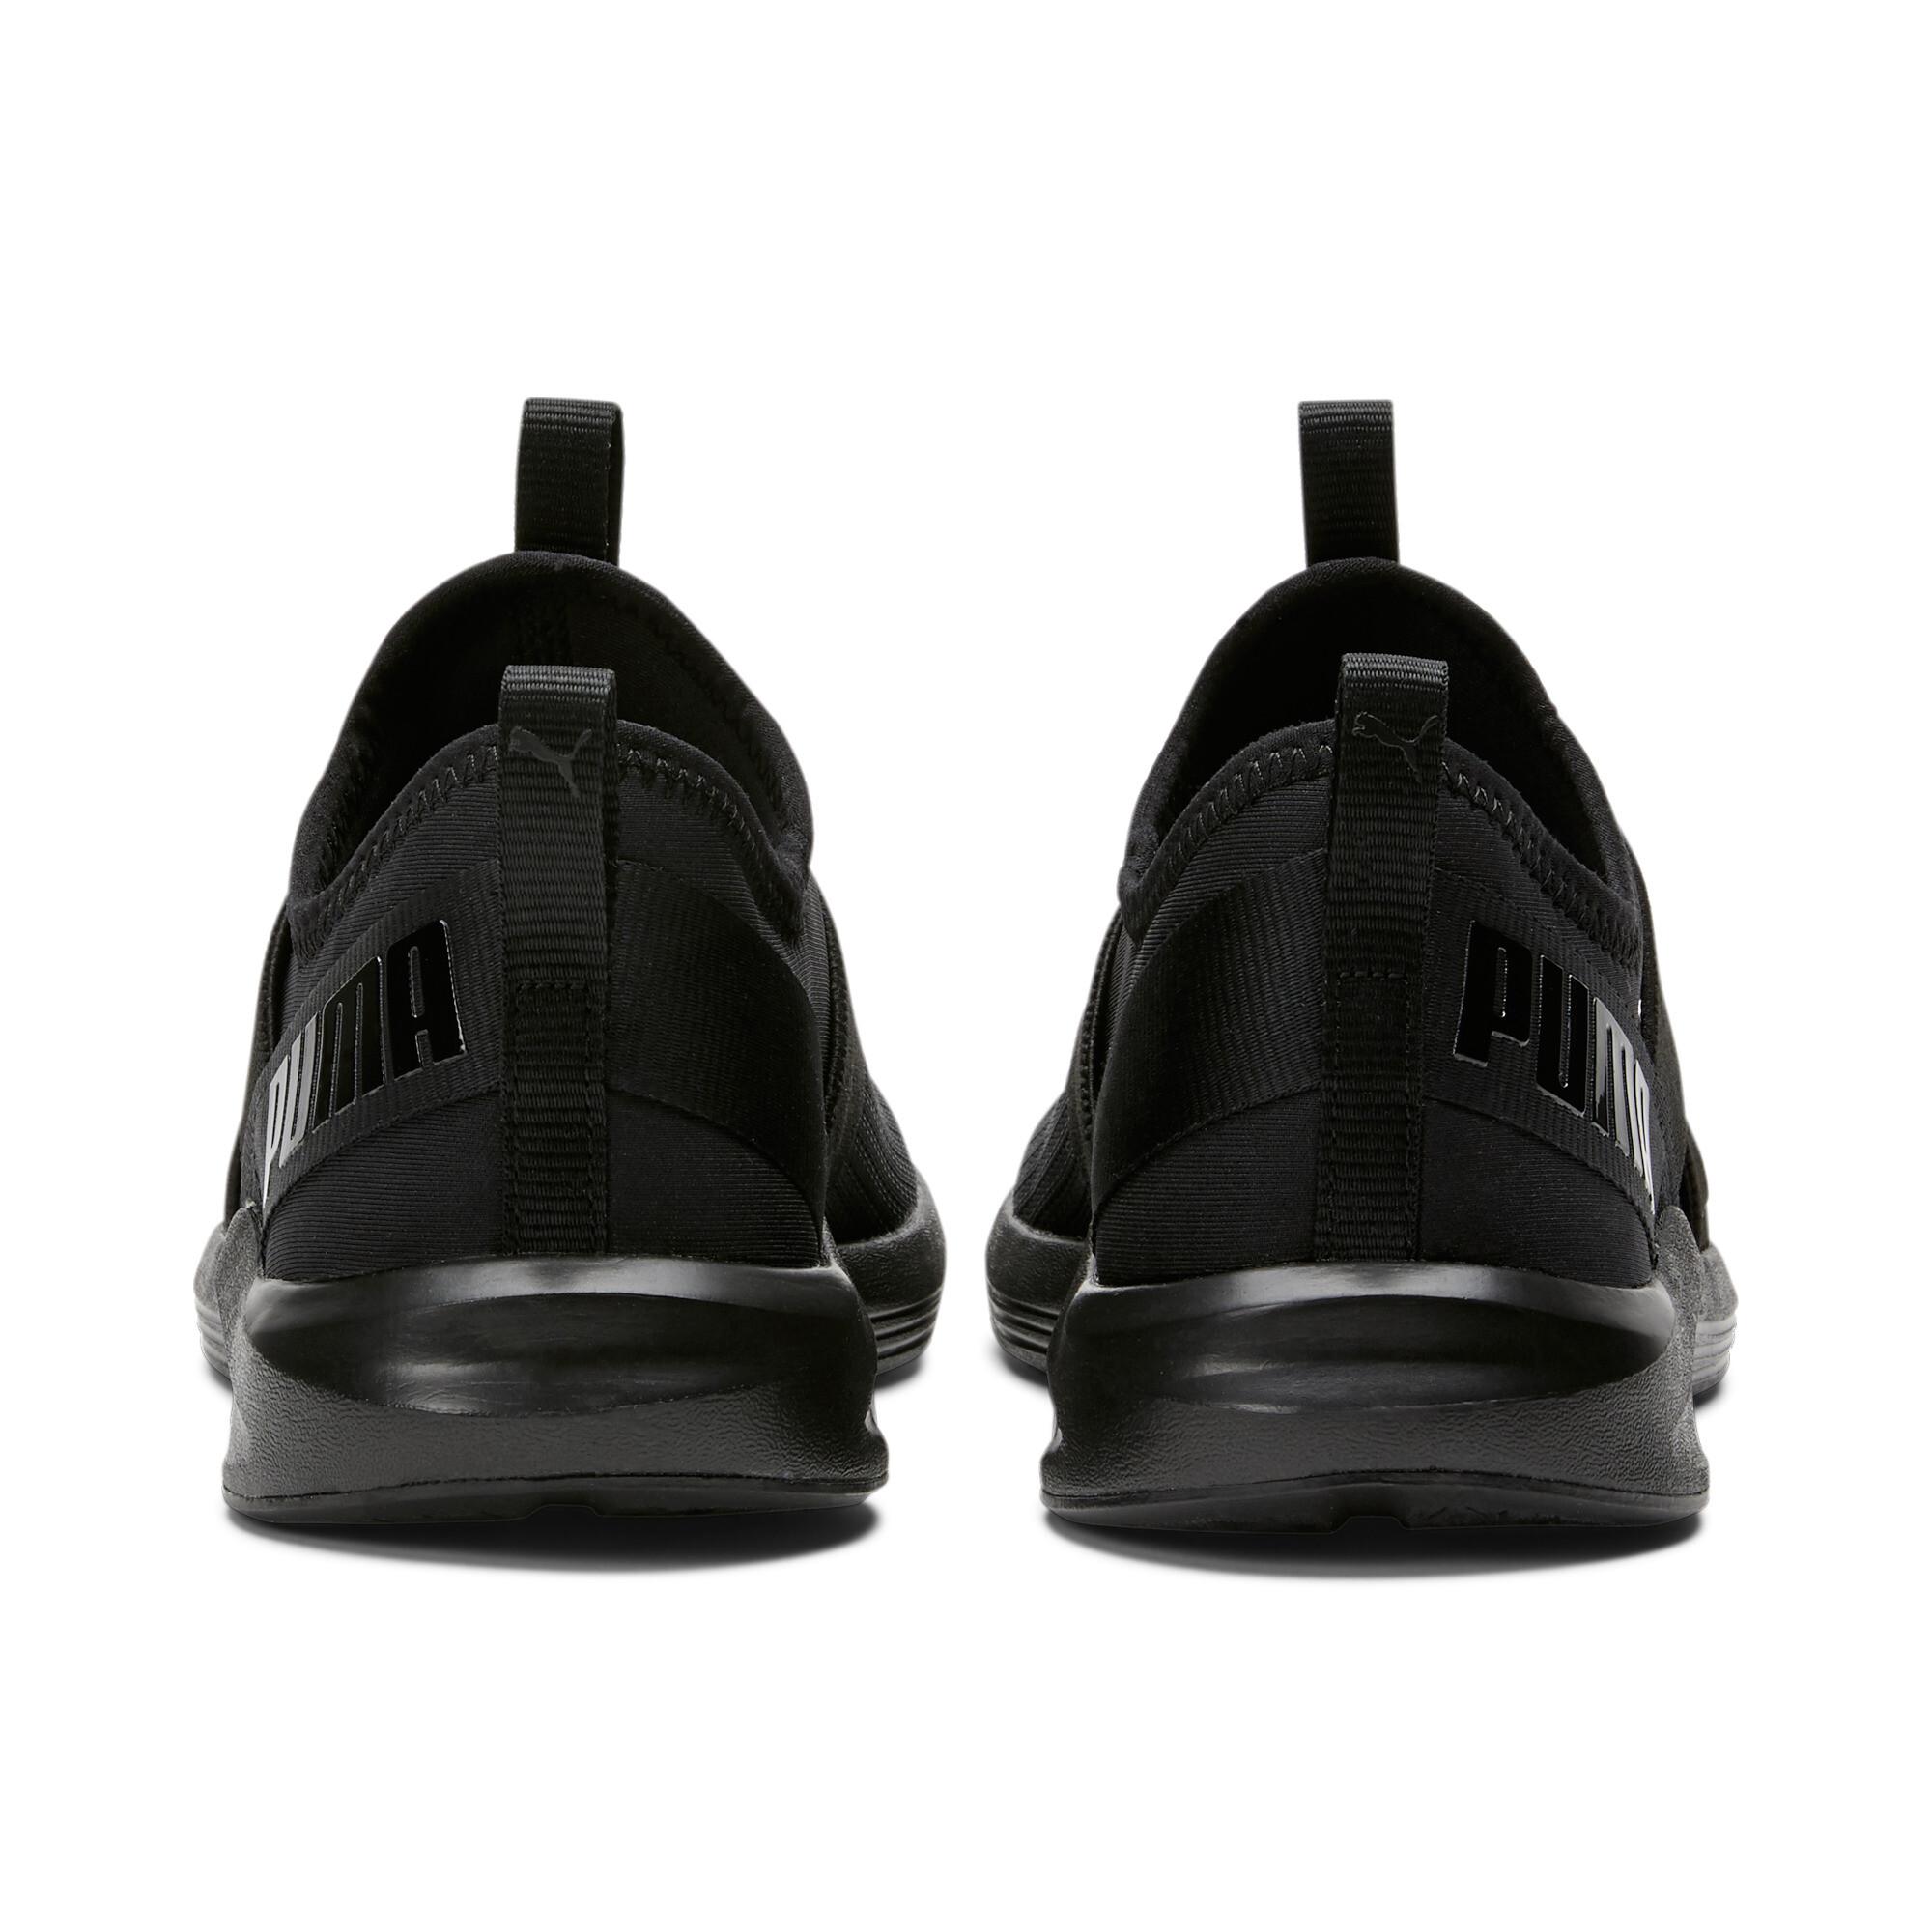 thumbnail 10 - PUMA Women's Prowl Slip On Training Shoes